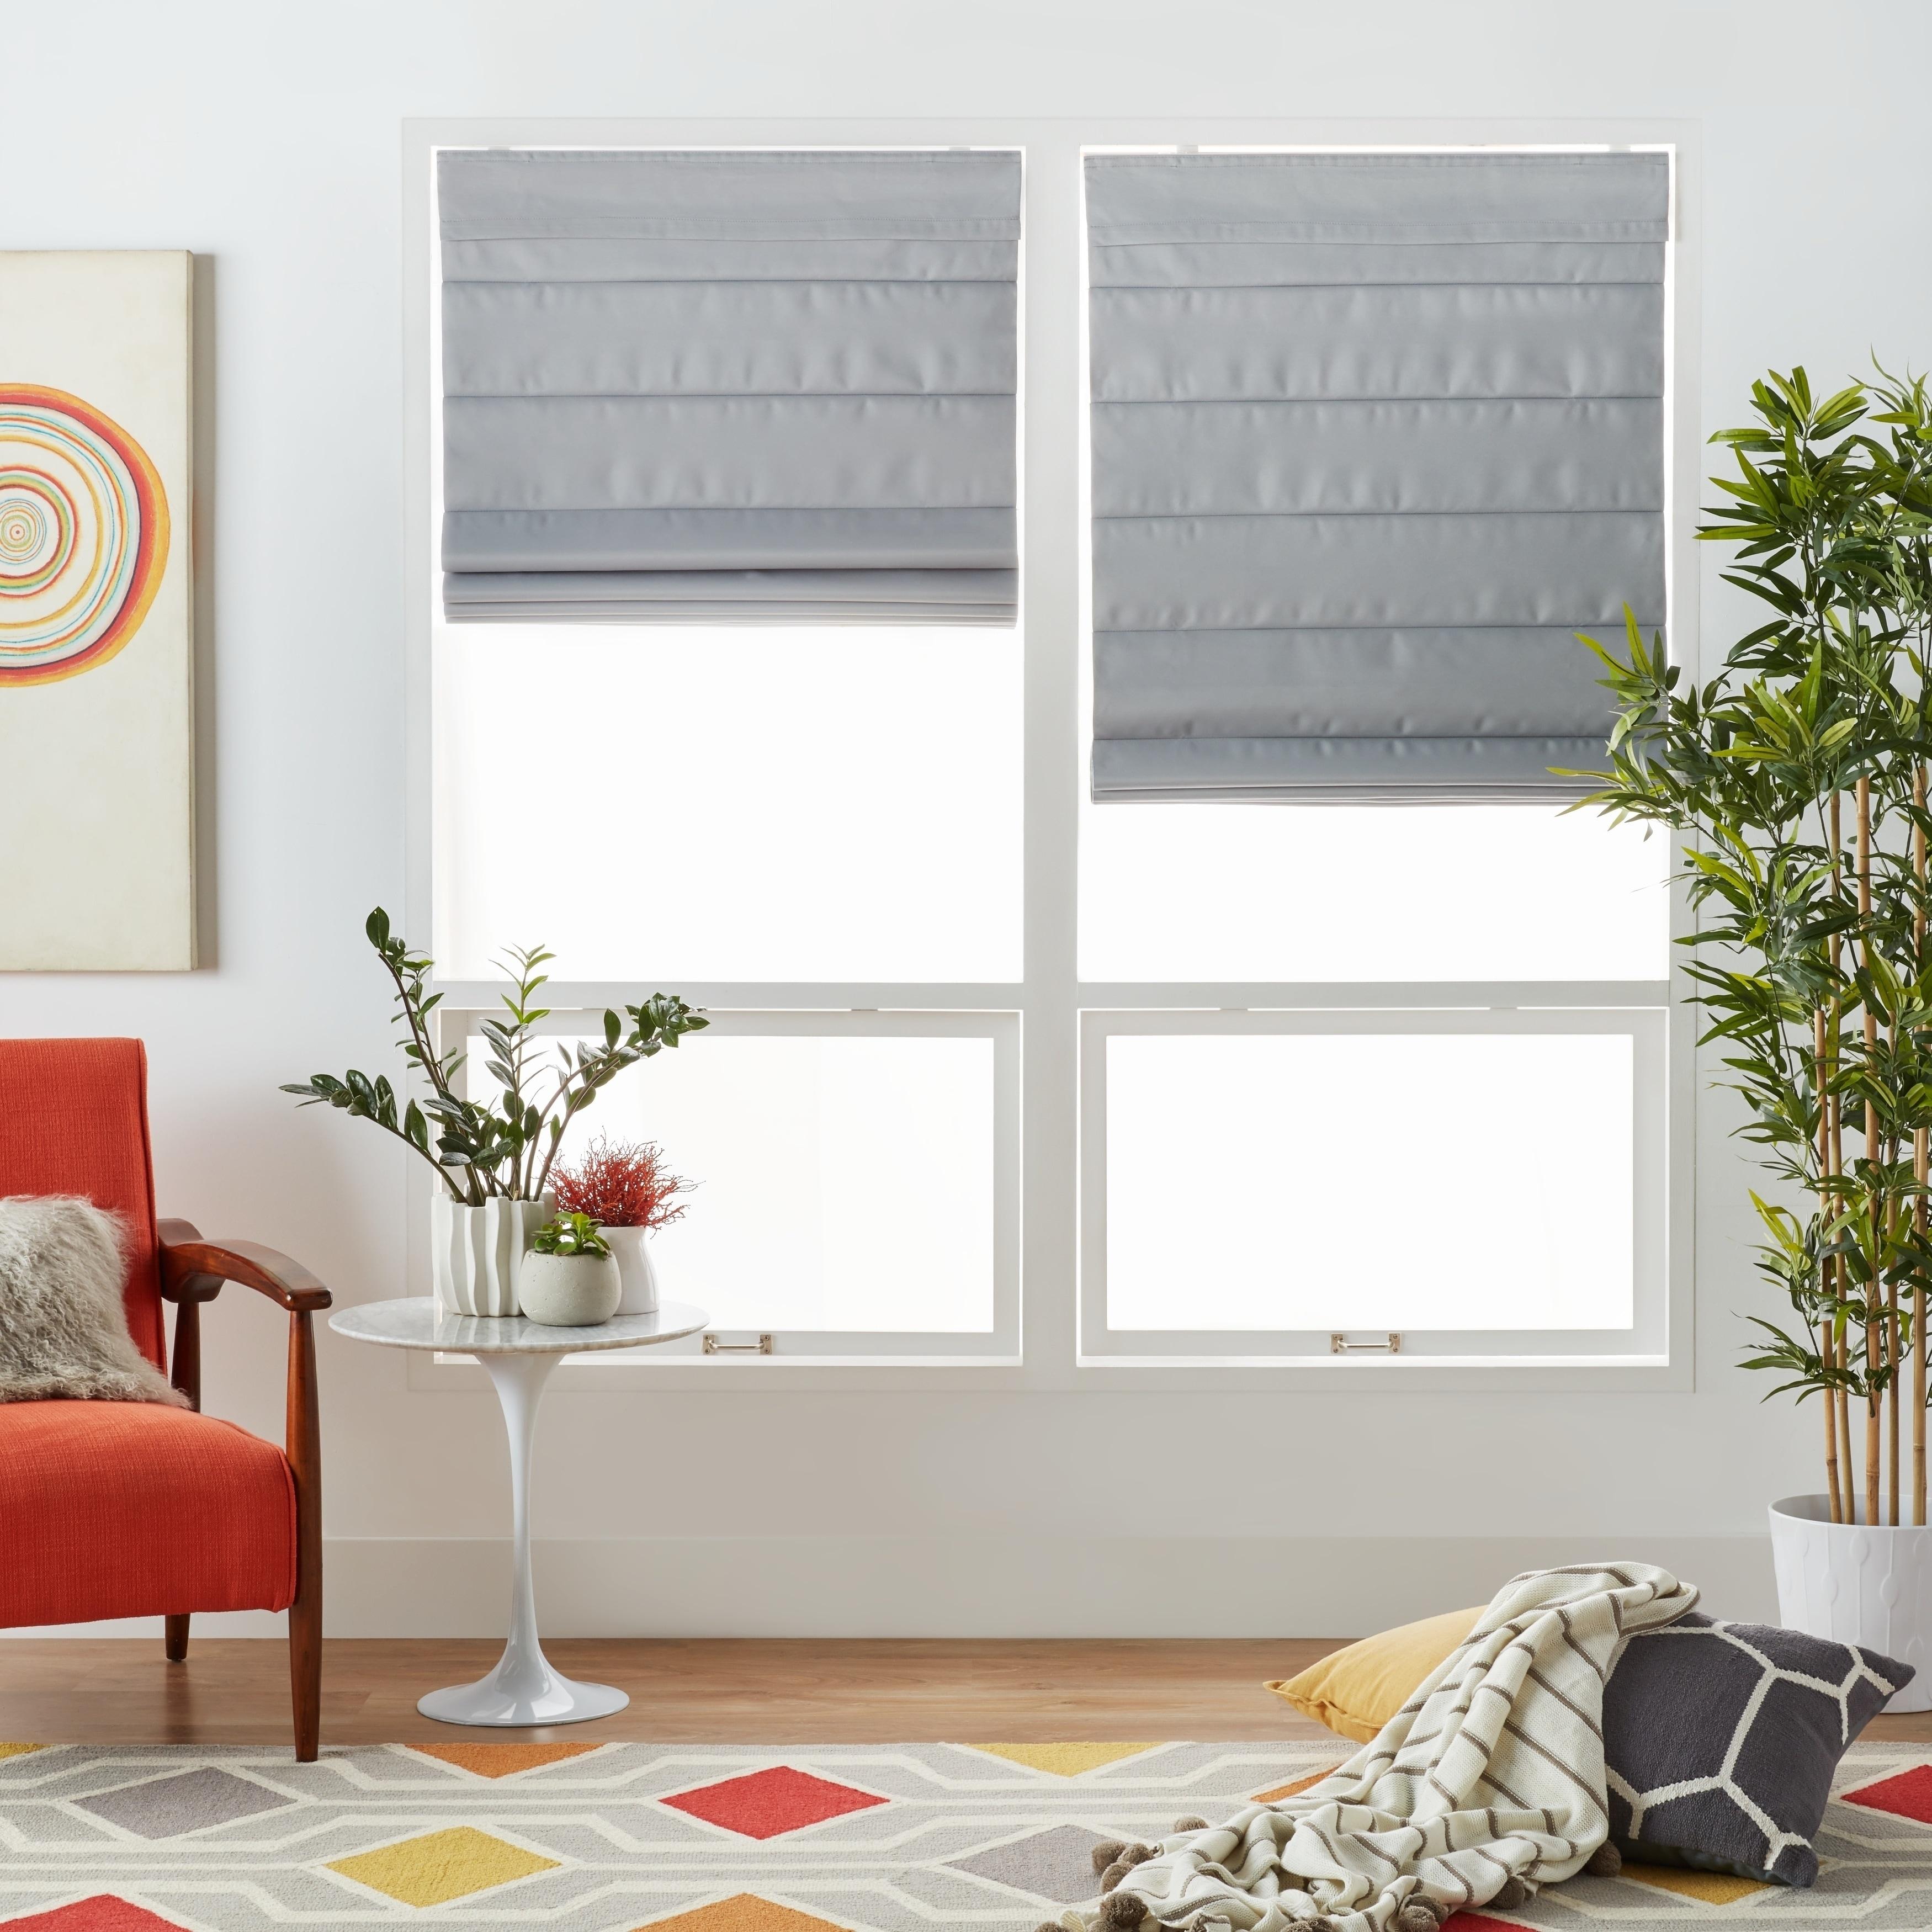 Fantastic Arlo Blinds Grey Room Darkening Cordless Lift Fabric Roman Shades Interior Design Ideas Gentotryabchikinfo